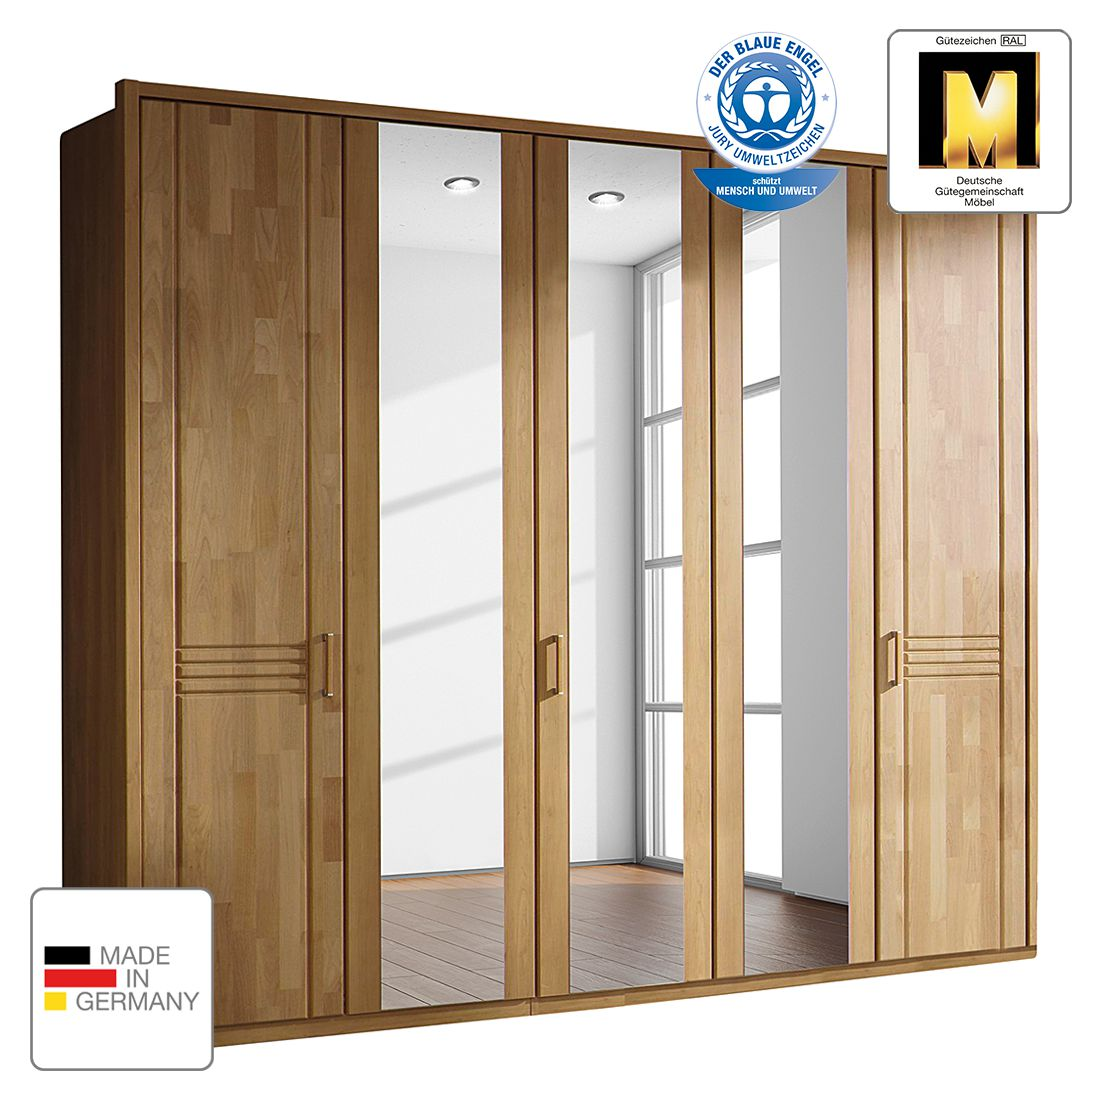 goedkoop Draaideurkast Savina Wild eikenhout 235cm 5 deurs 1 spiegeldeur Met Passe partout lijst Rauch Steffen